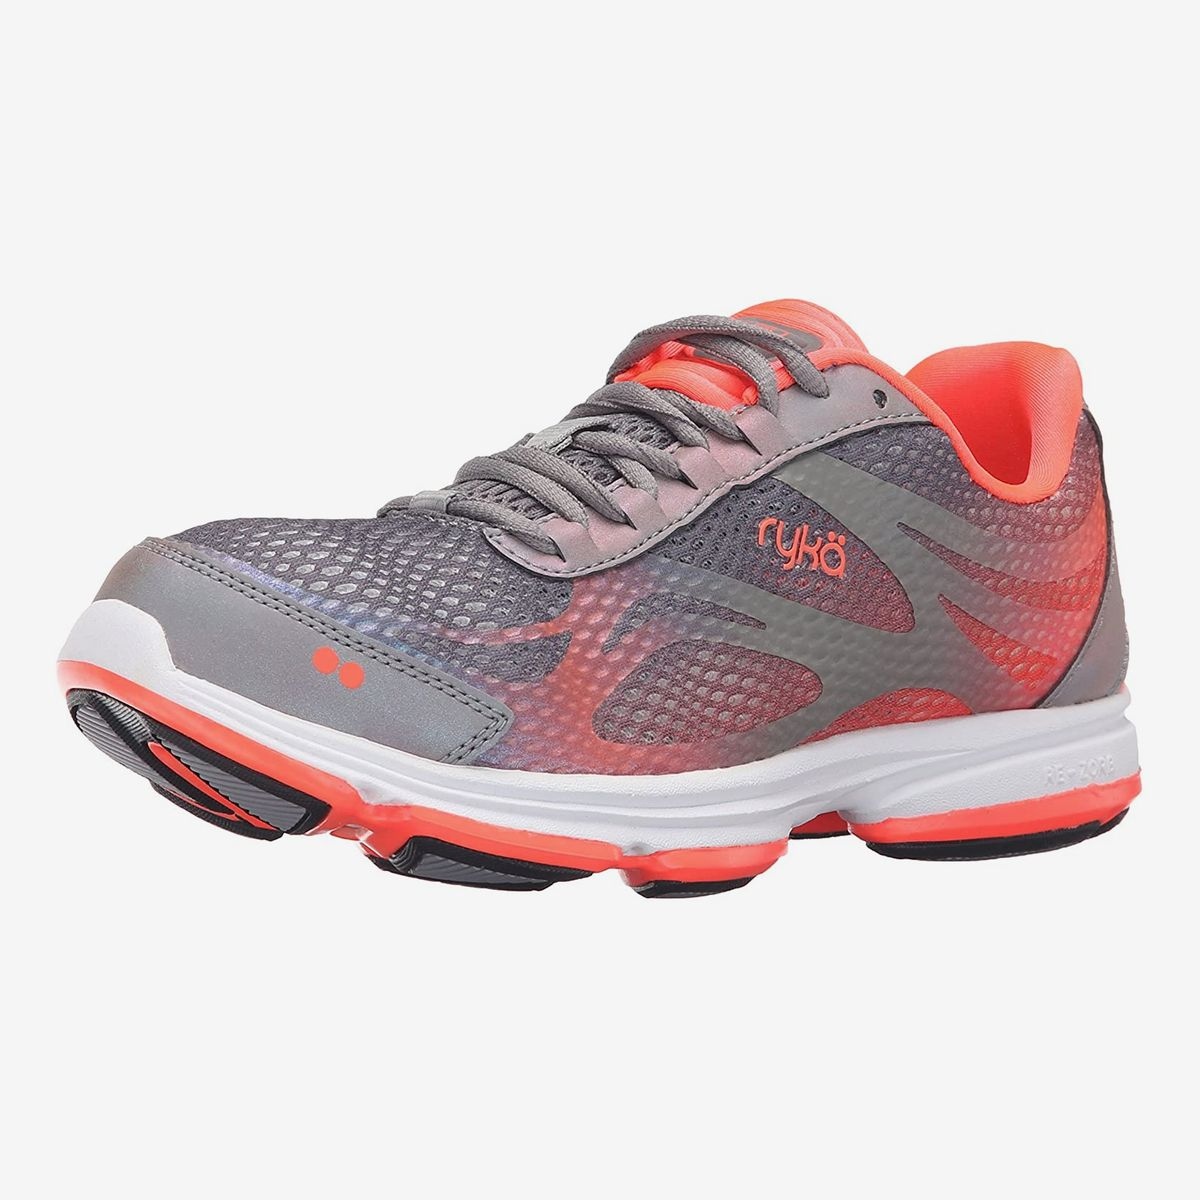 Men/'s Sport Sneaker Non-slip Hiking Running Tennis Walking Tranier Breath Shoes